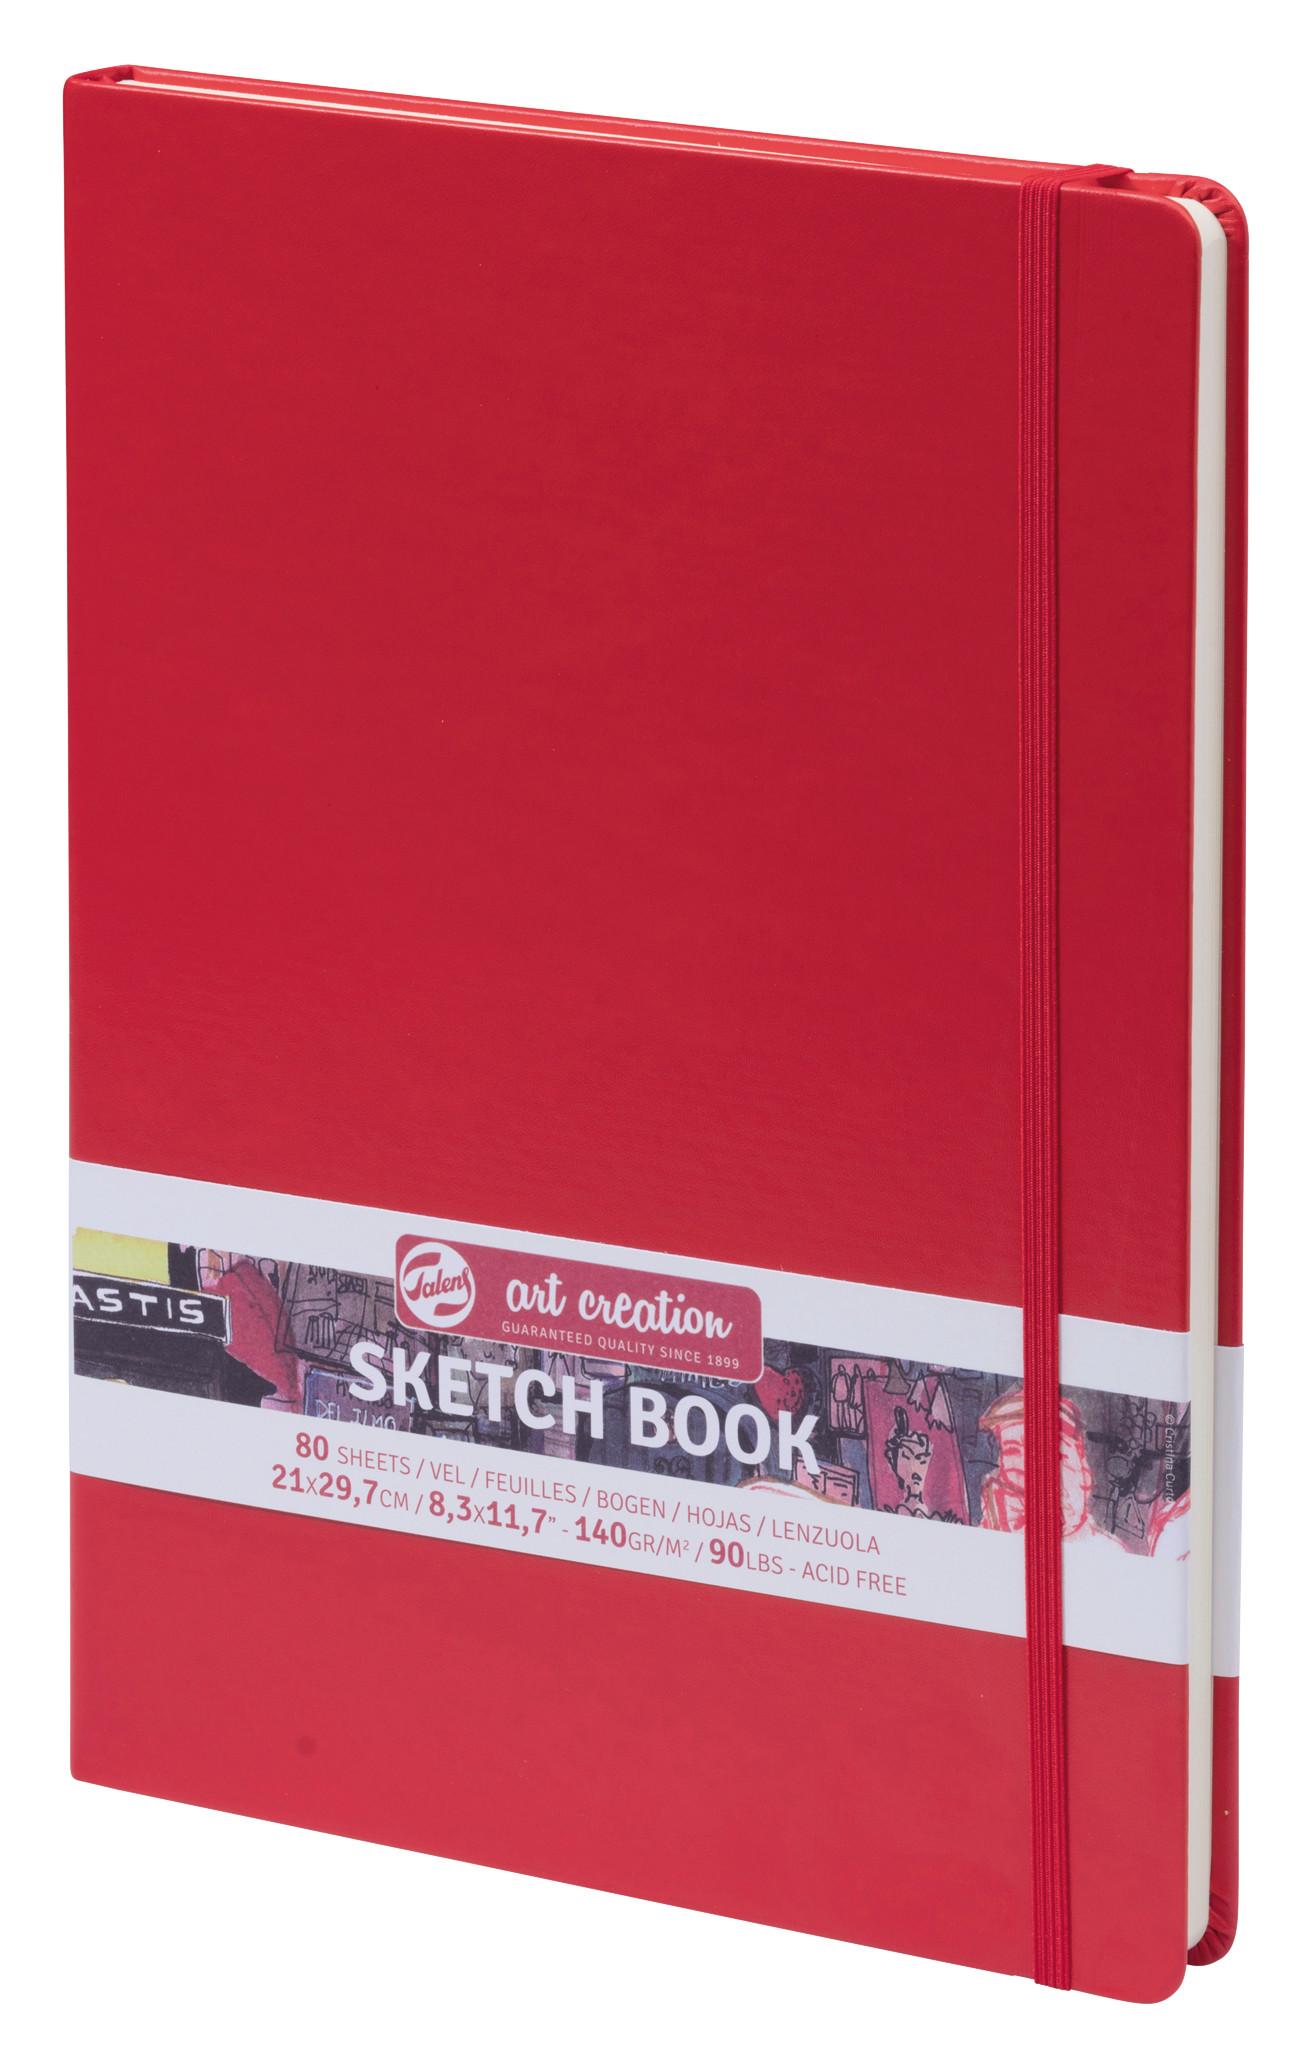 Talens Art Creation Sketchbook Red 21X29,7 cm, 140 Grams